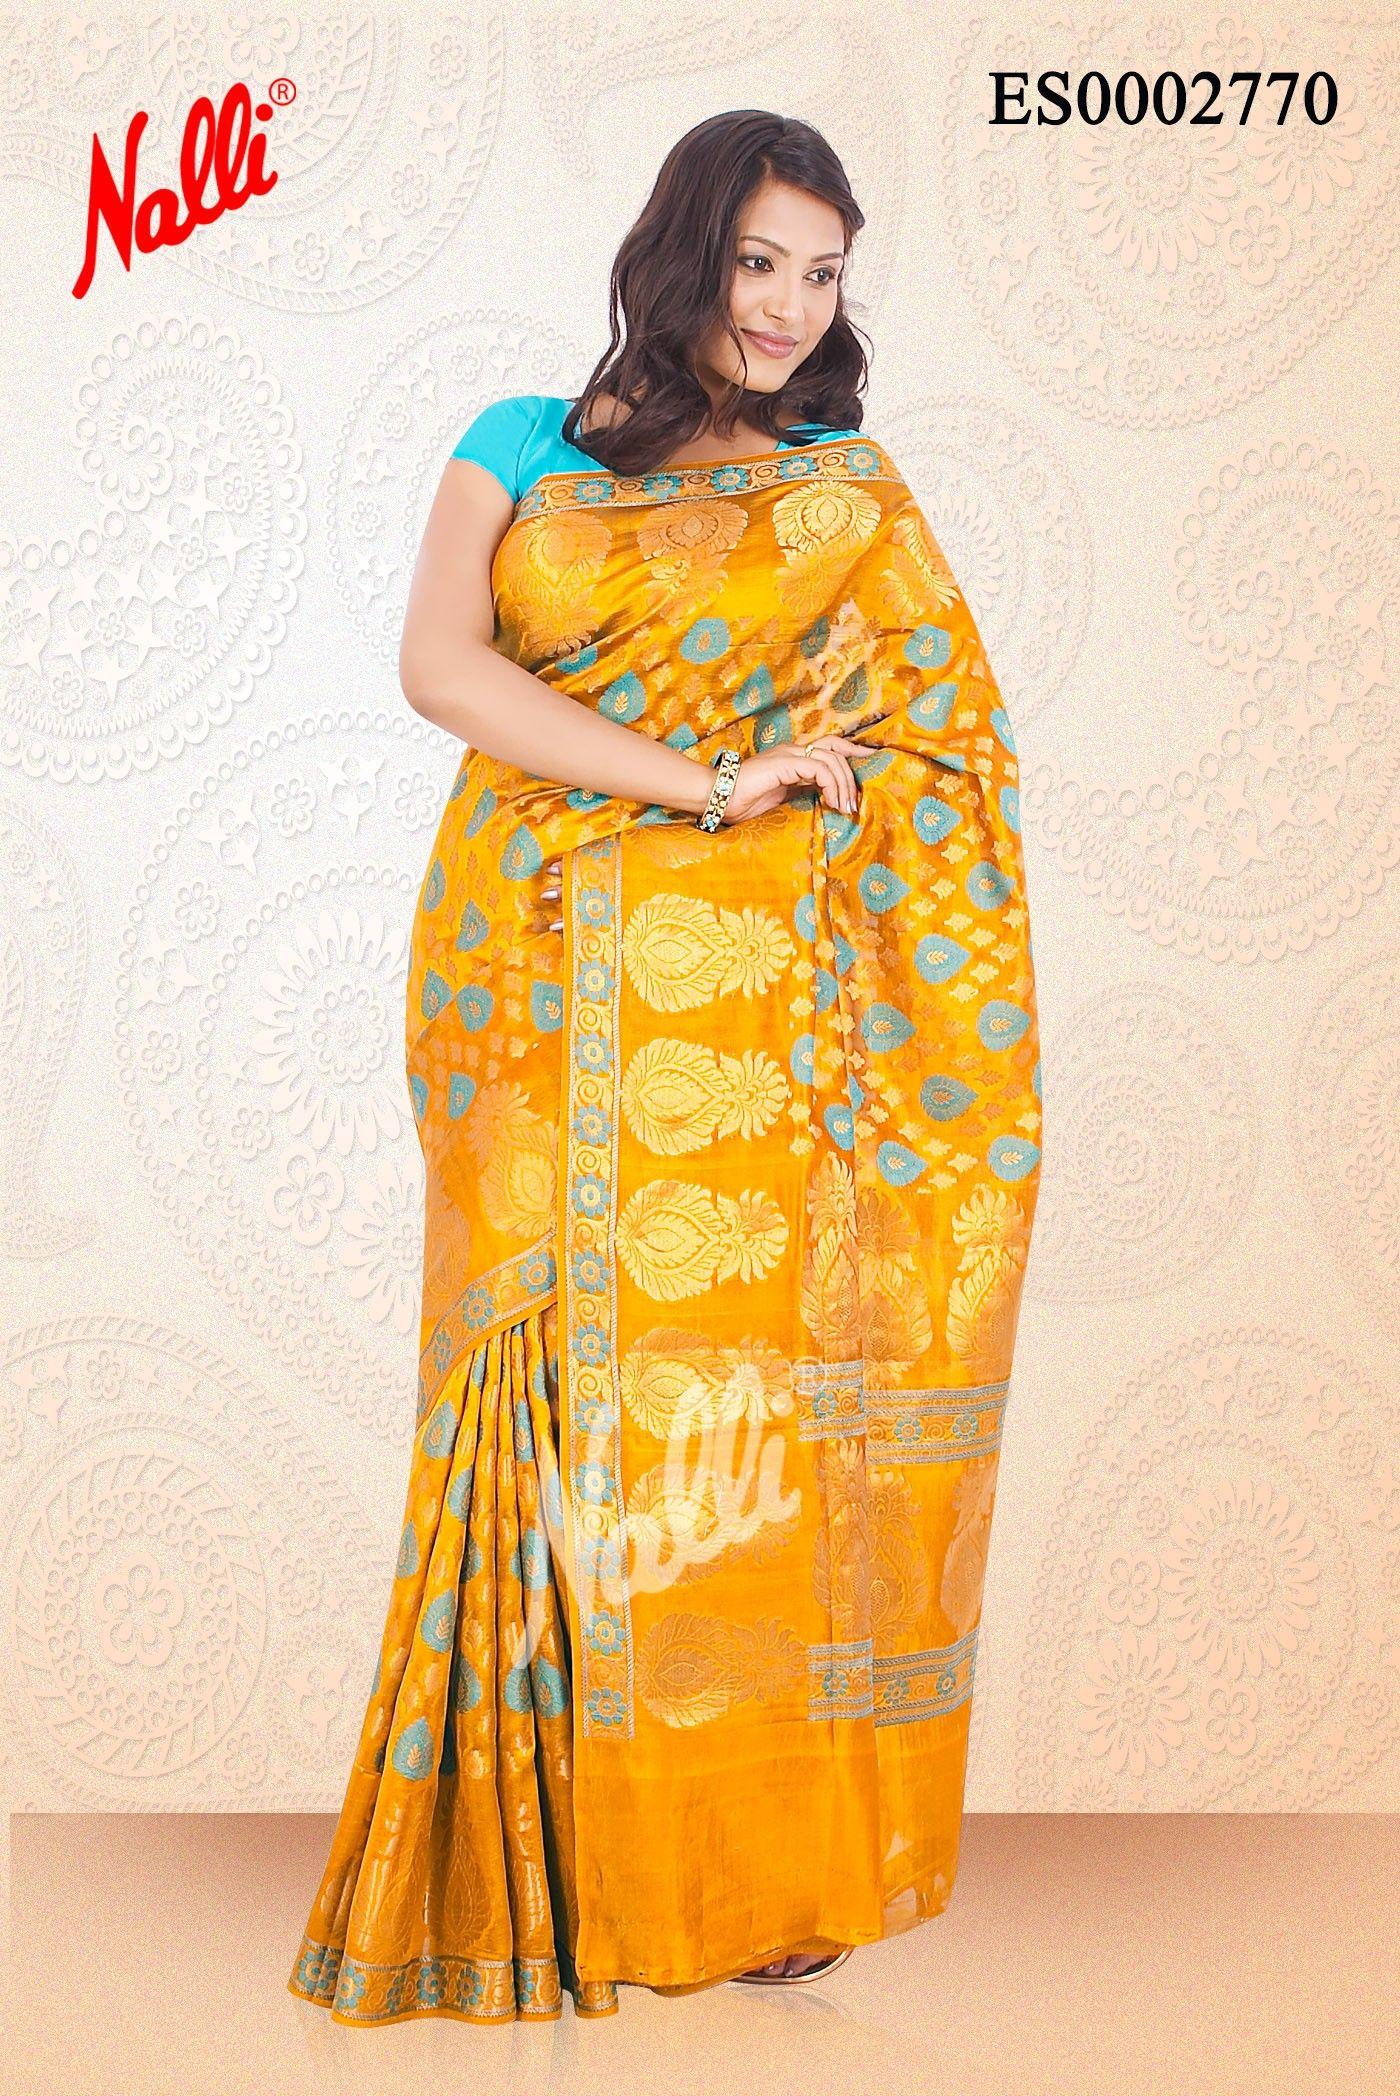 b4eb11b6d640df Mustard Banaras  Dupion Silk Saree with Body Butta and Zari Border.  Includes Unstitched Blouse